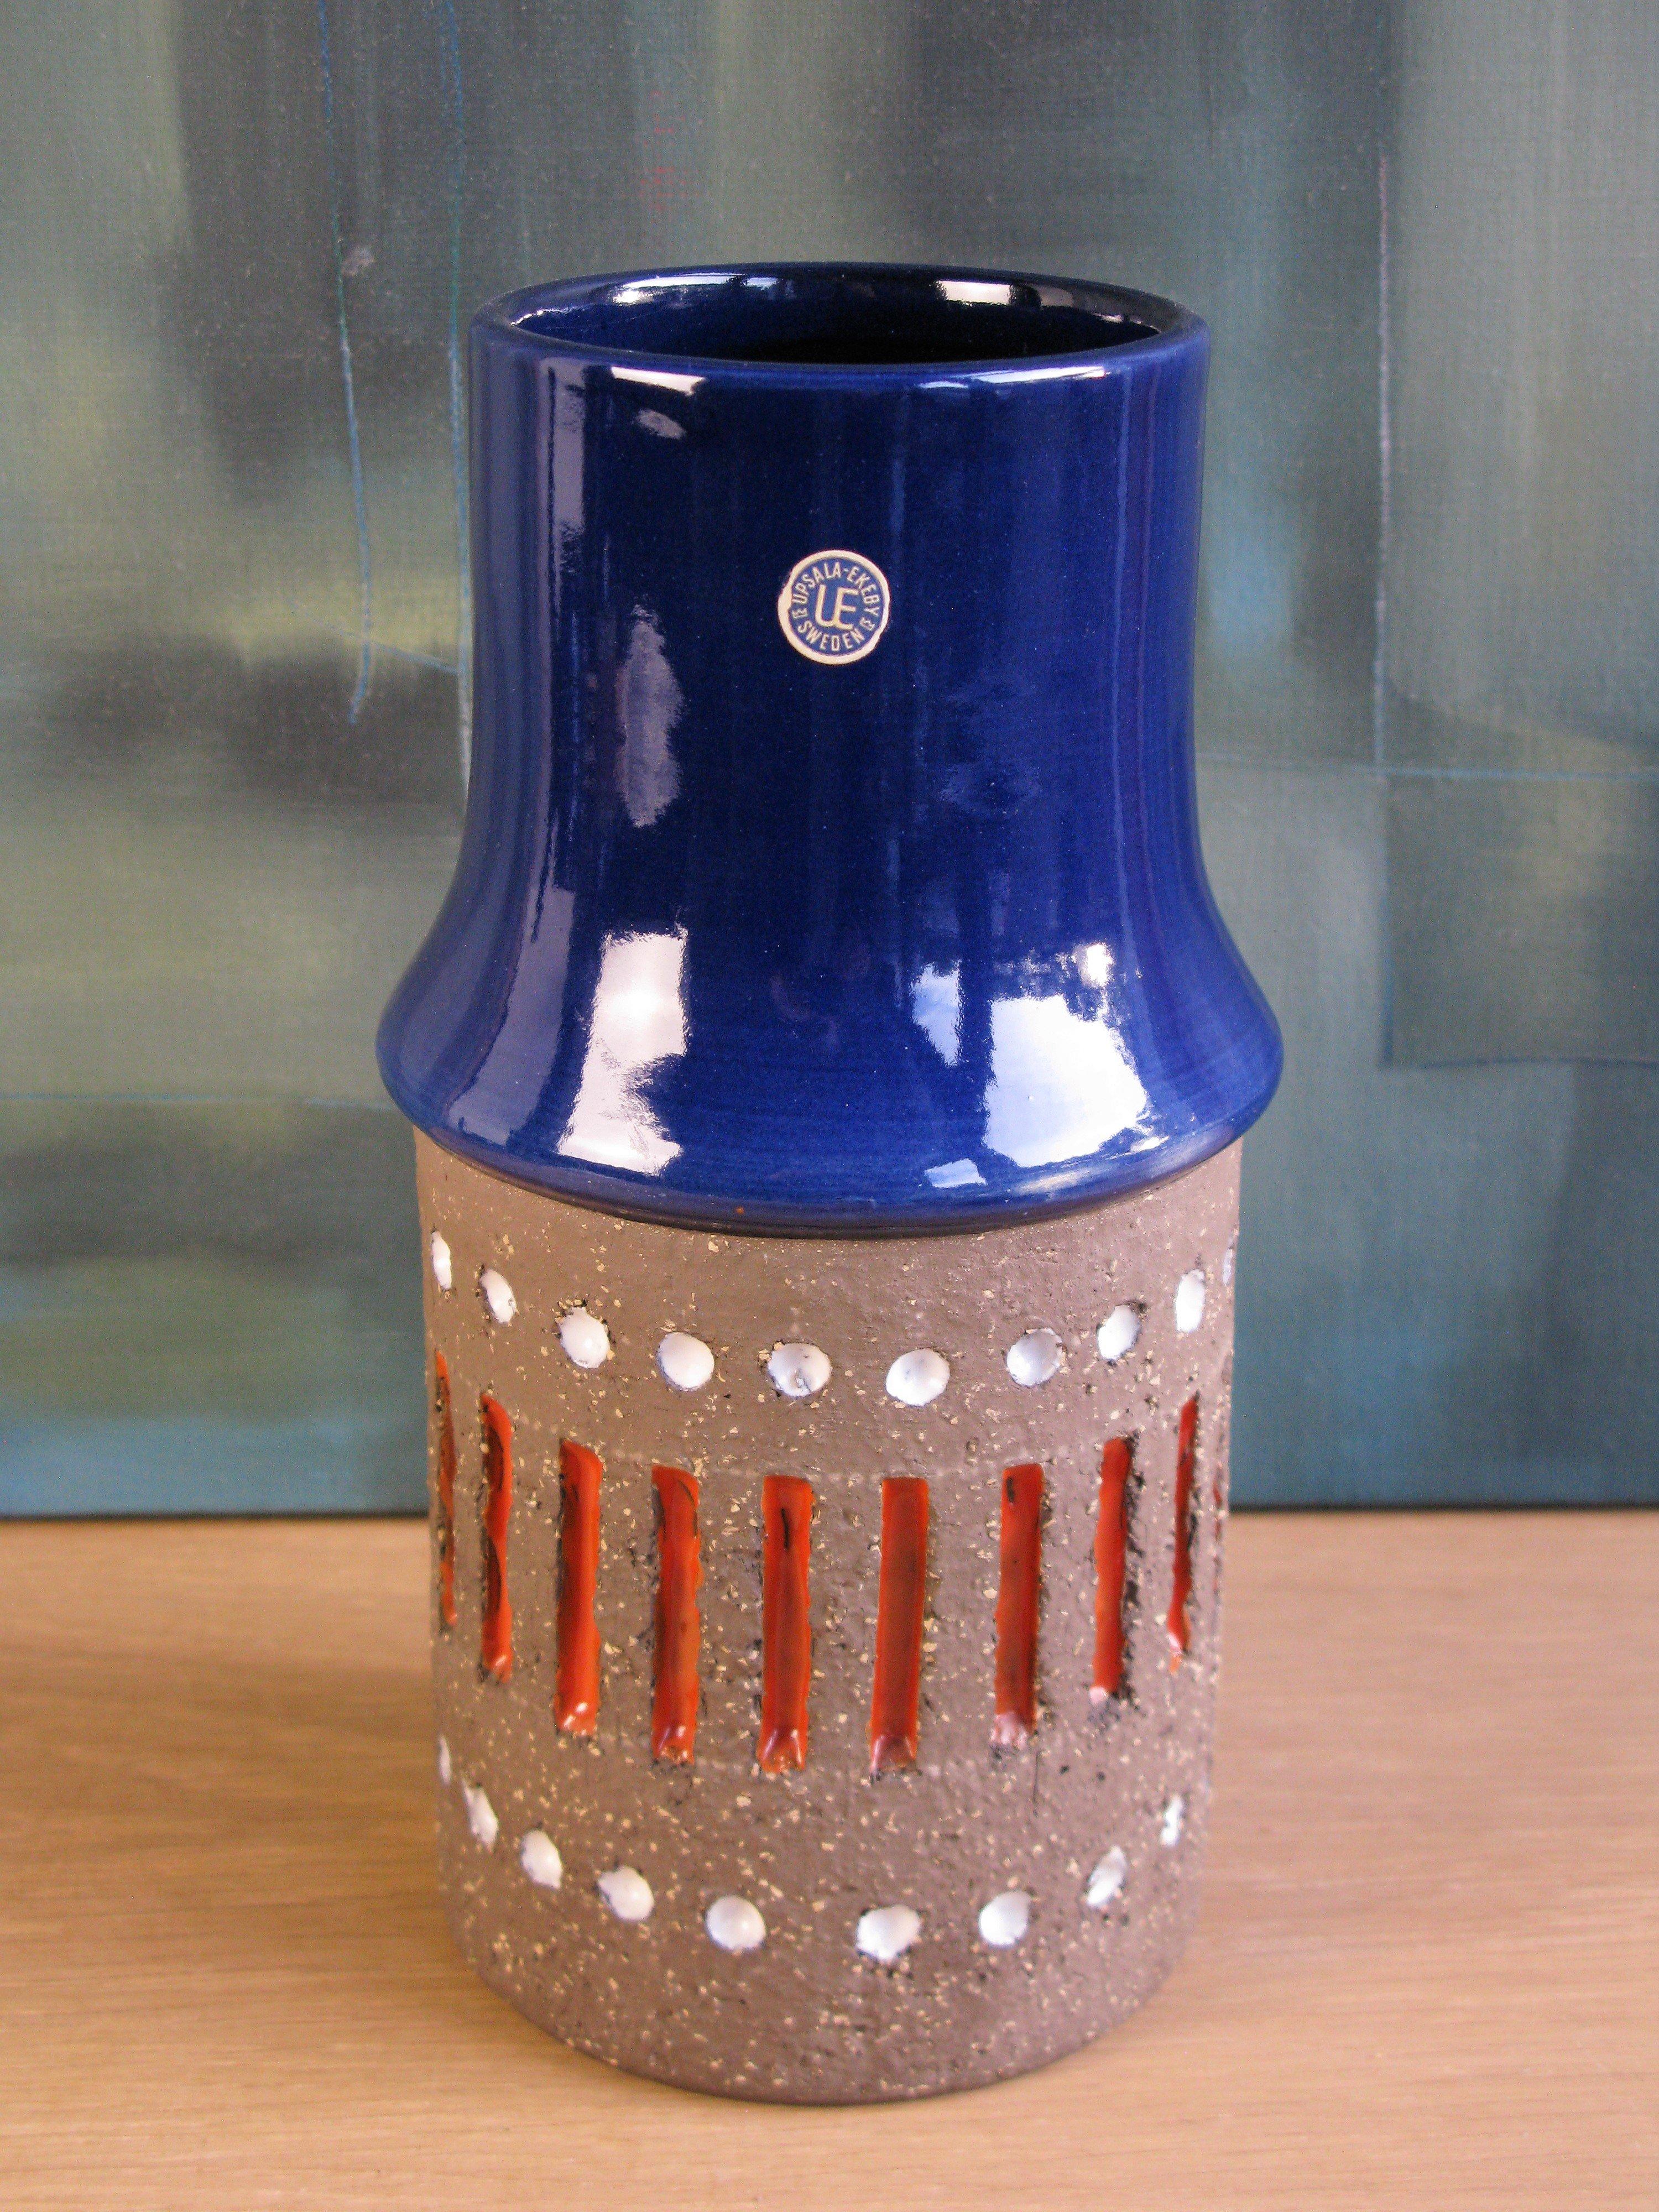 å/h kaskad vase 43130-212